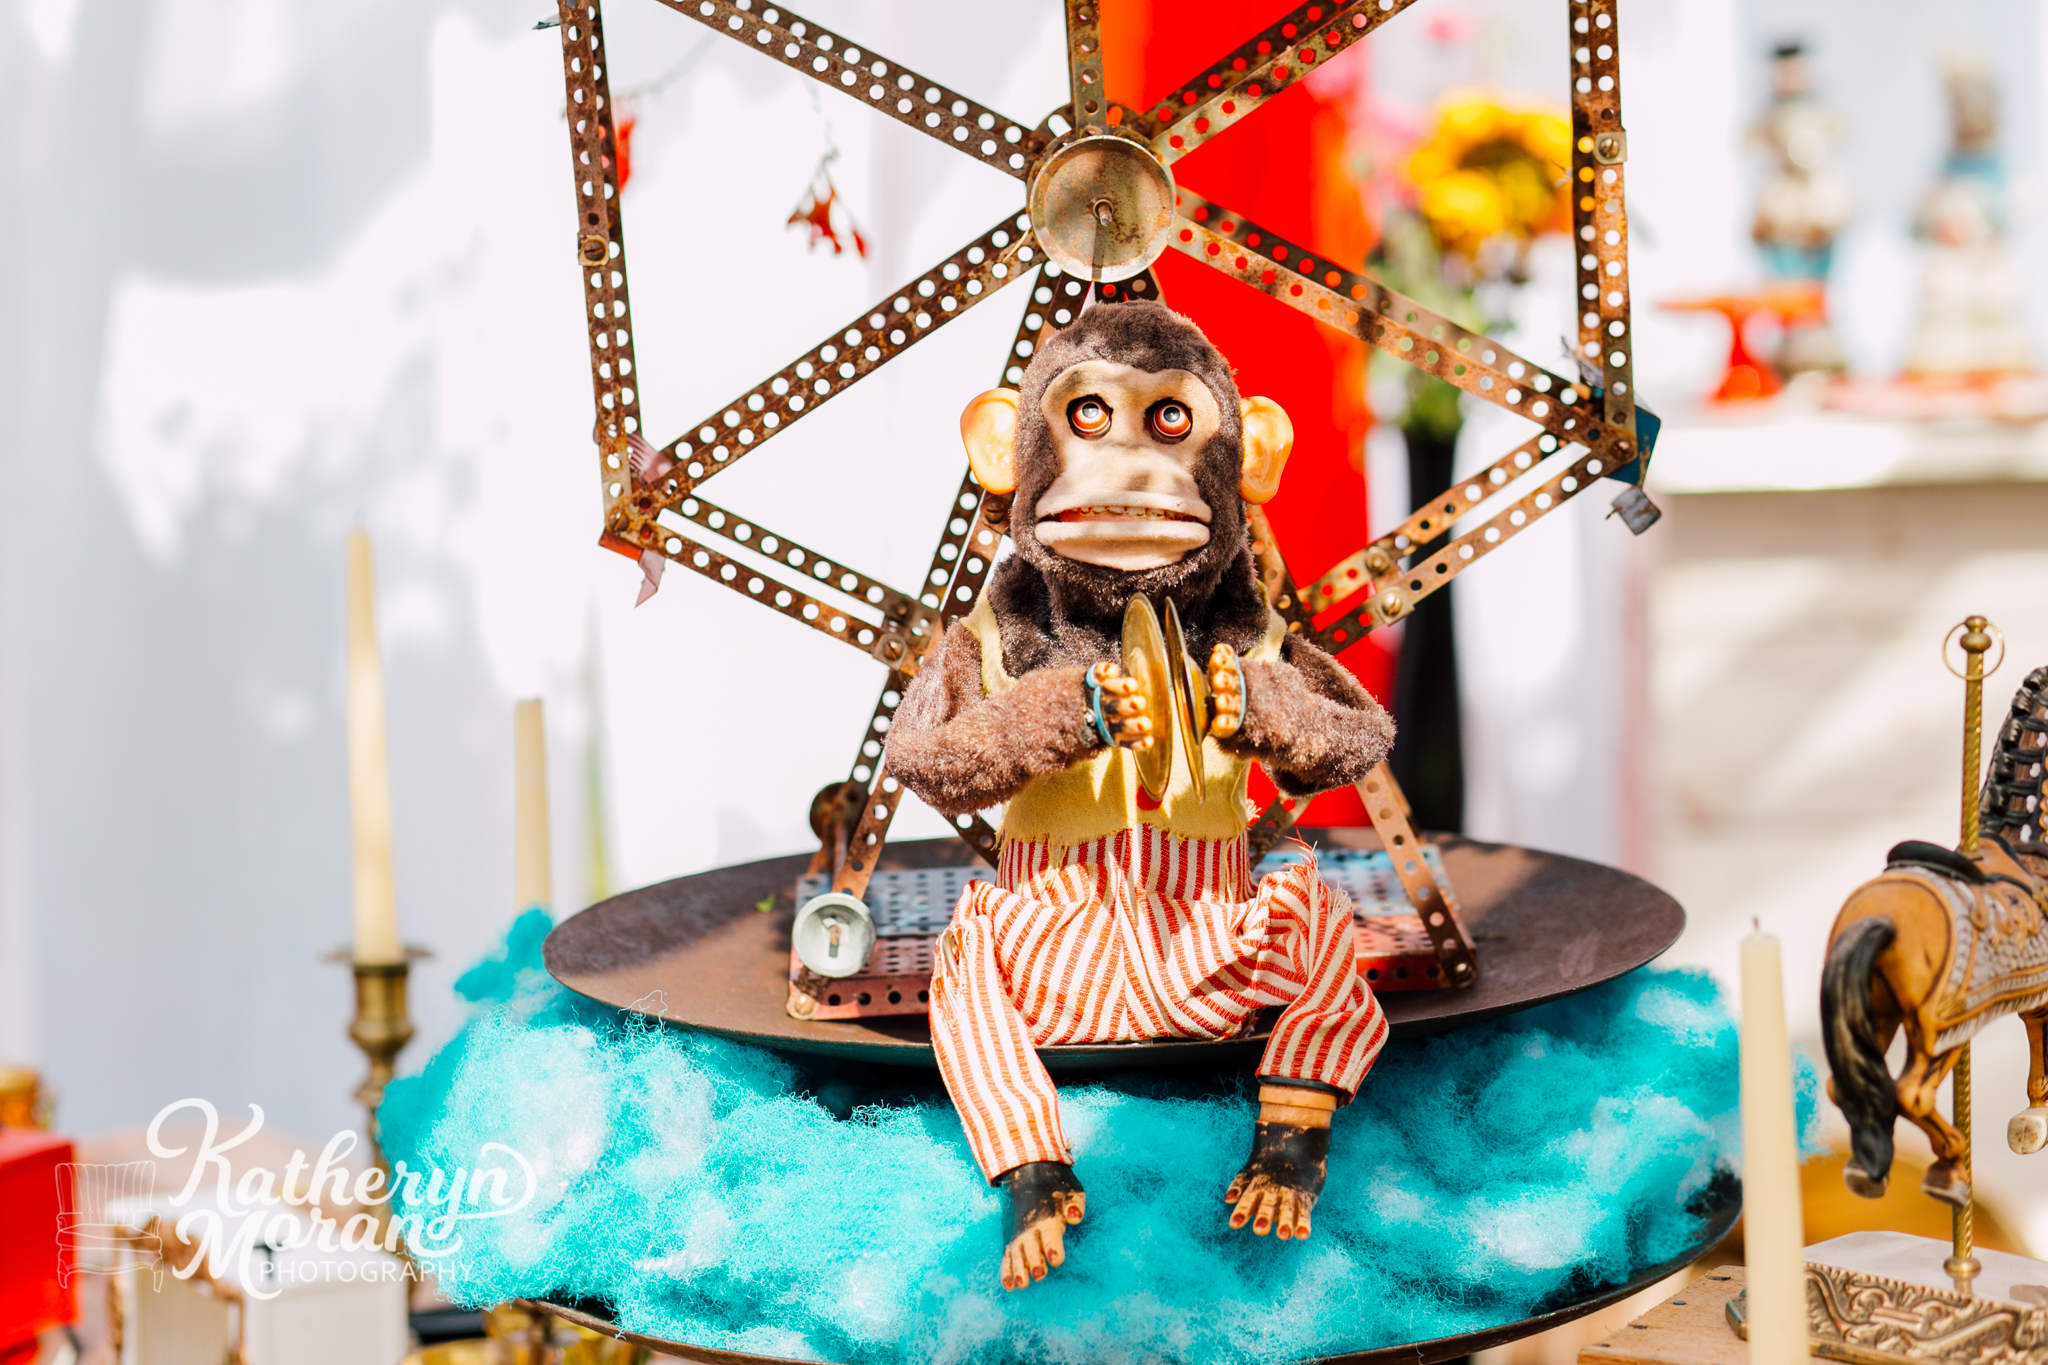 bellingham-seattle-event-photographer-vintage-circus-styled-katheryn-moran-39.jpg